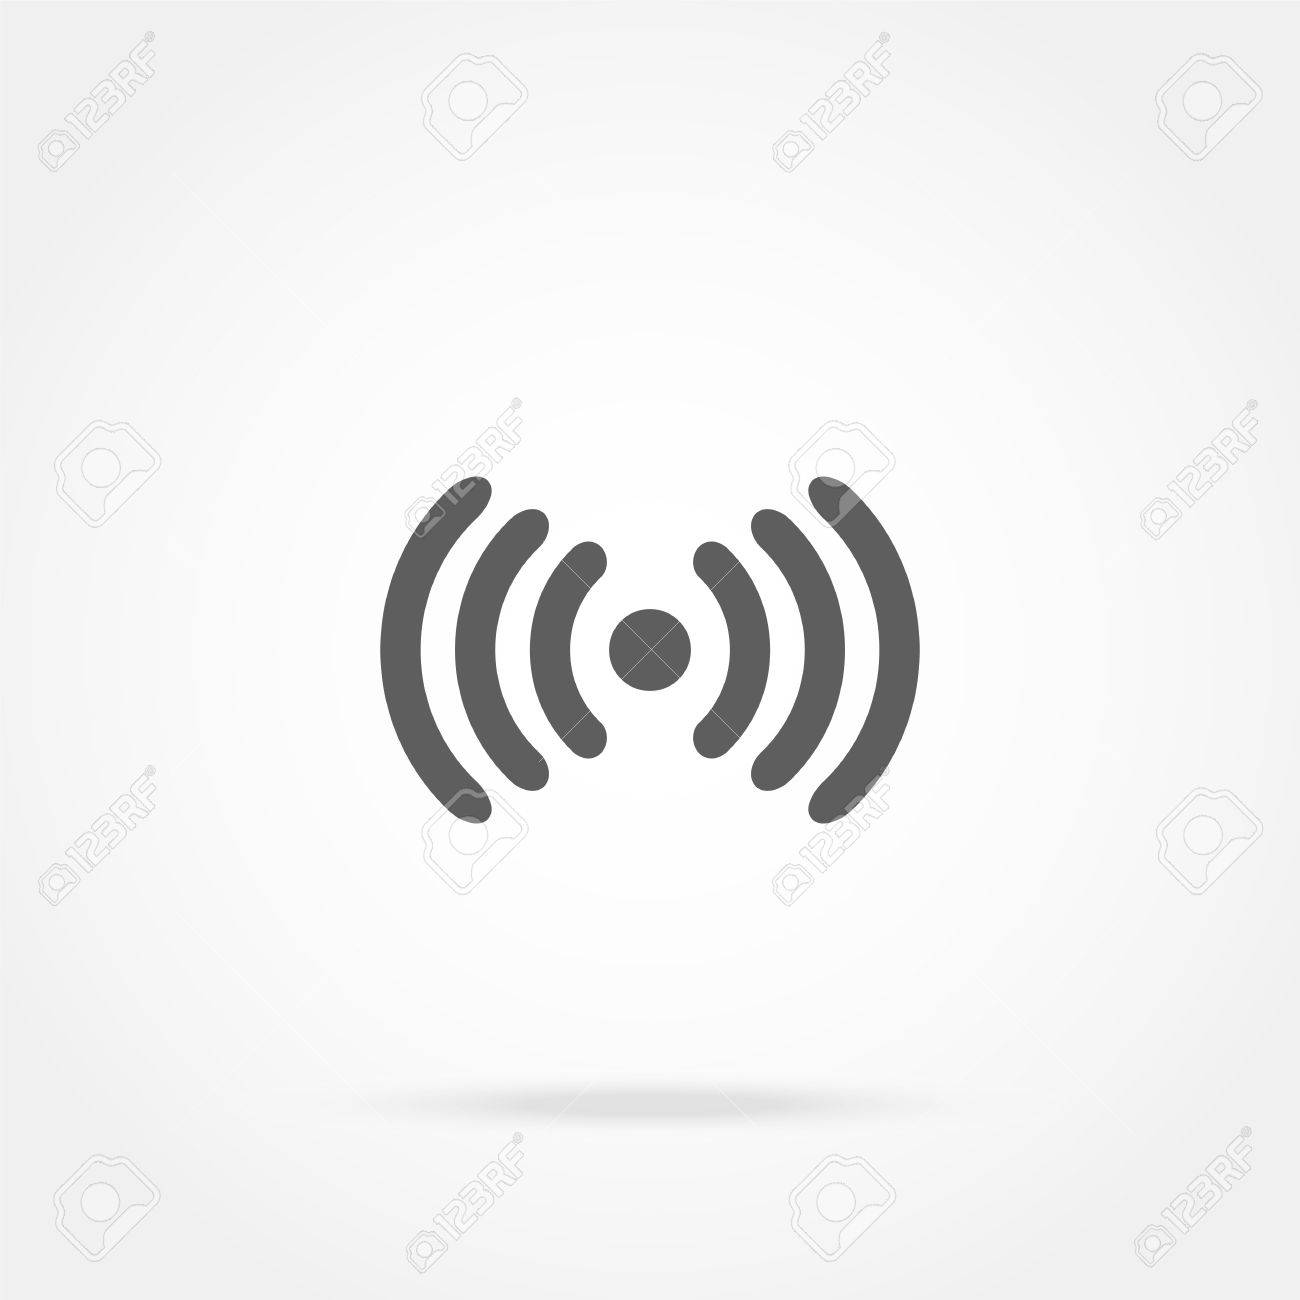 icons Wi fi - 35177599